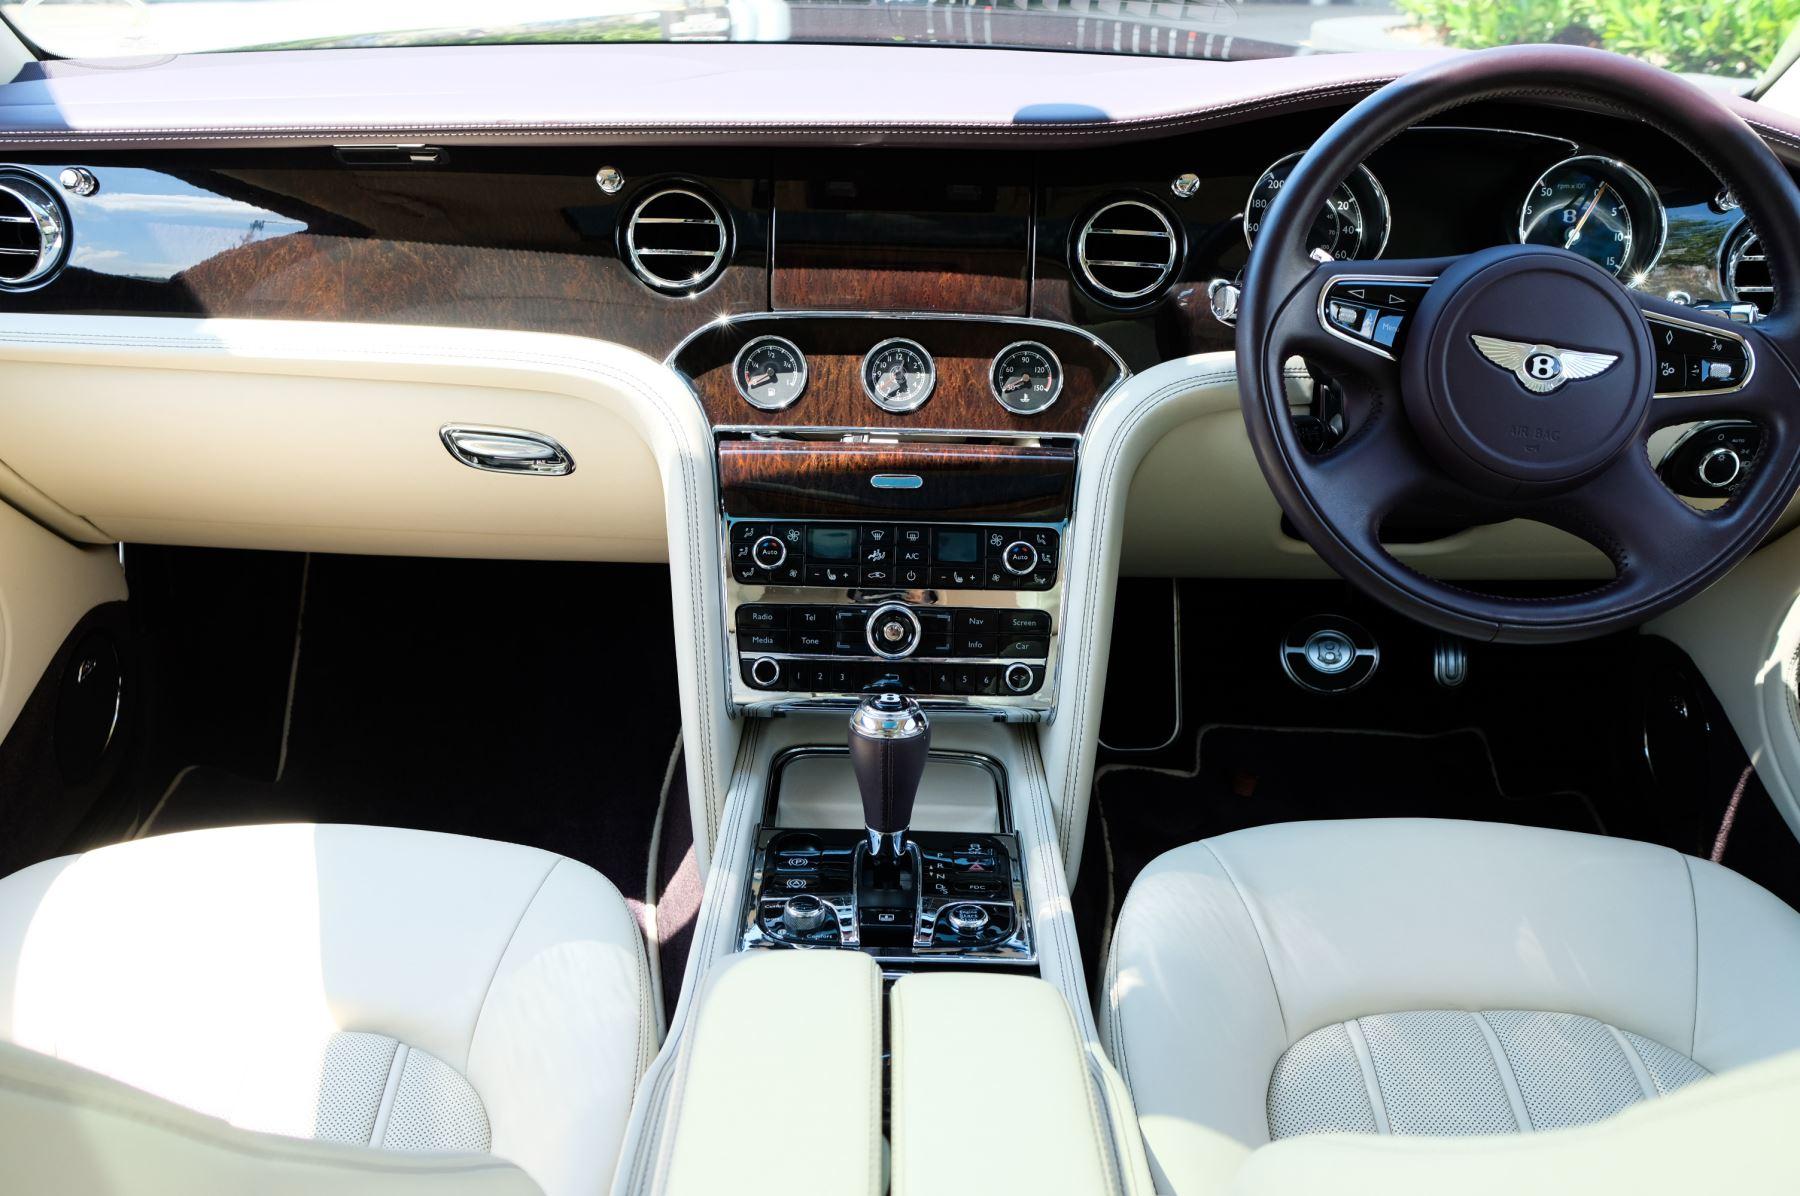 Bentley Mulsanne 6.8 V8 - Comfort, Entertainment and Premier Specification image 12